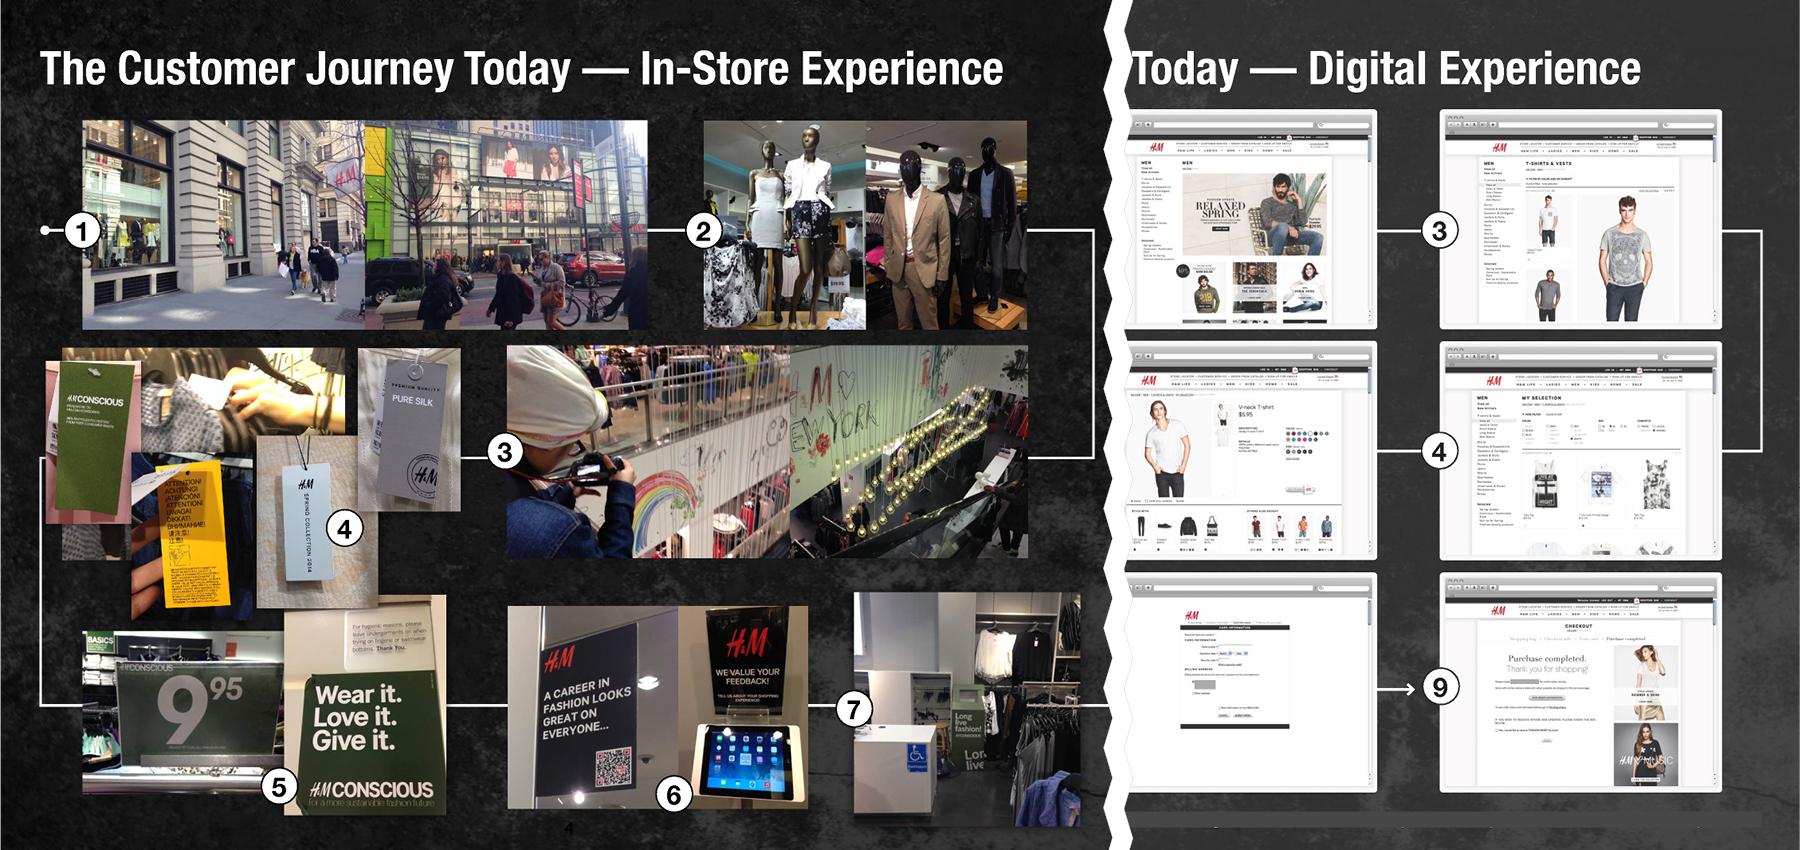 HM_customer_journey.jpg